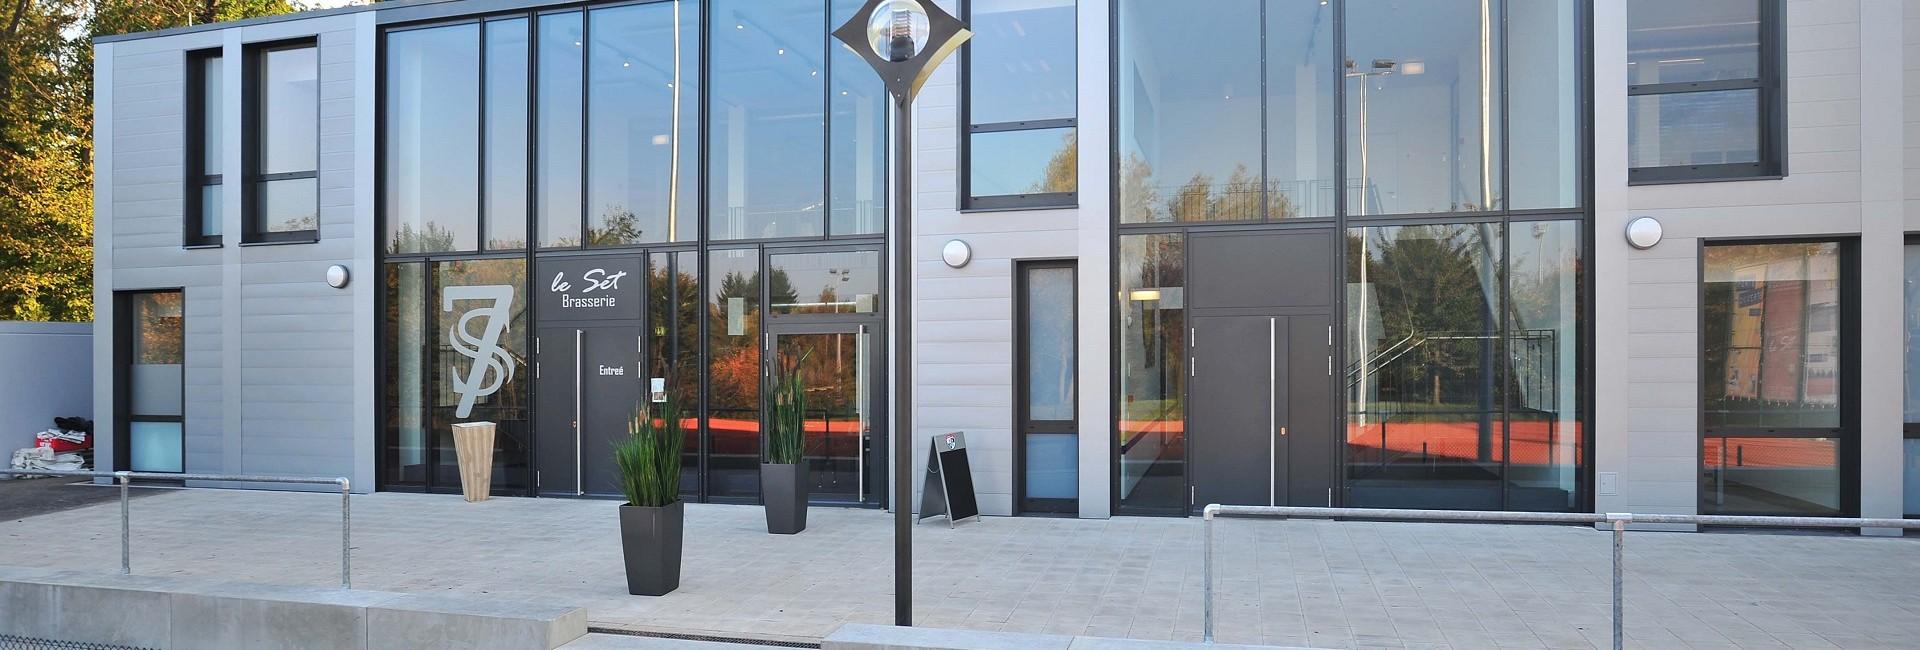 Foyer Des Arts Luxembourg Howald : Modulbau tennis howald multigone